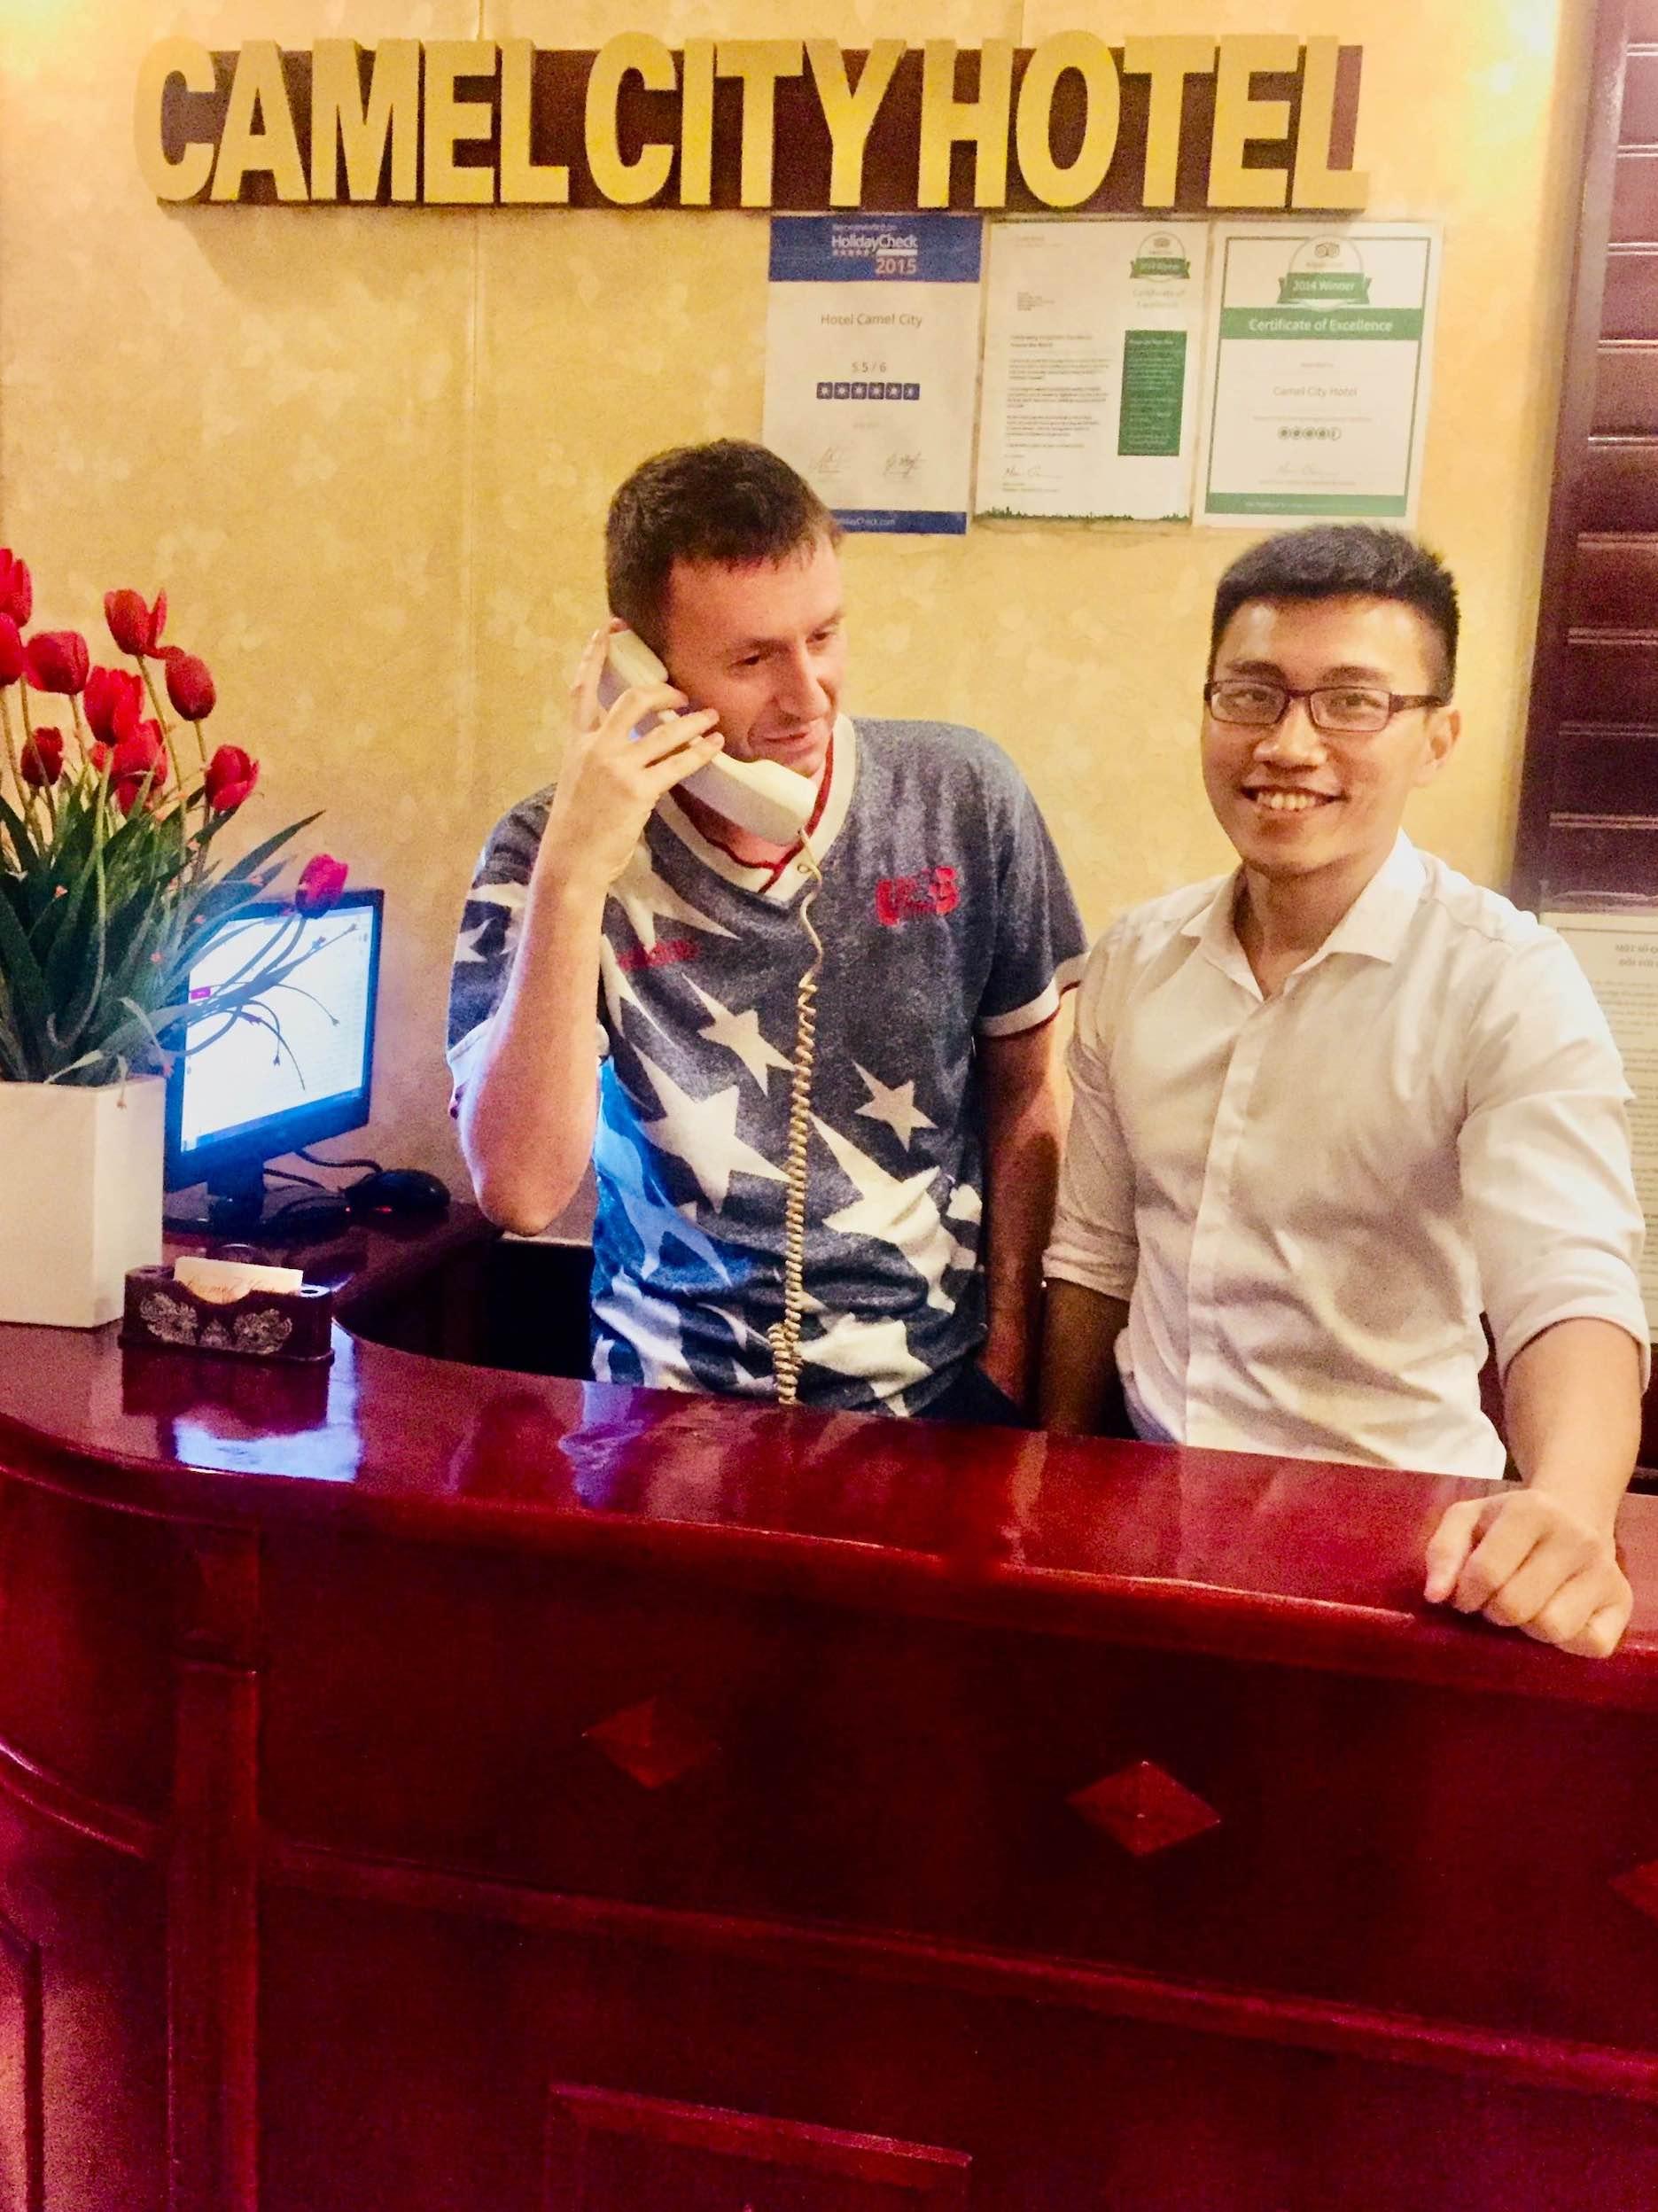 Reception desk Camel City Hotel in Hanoi